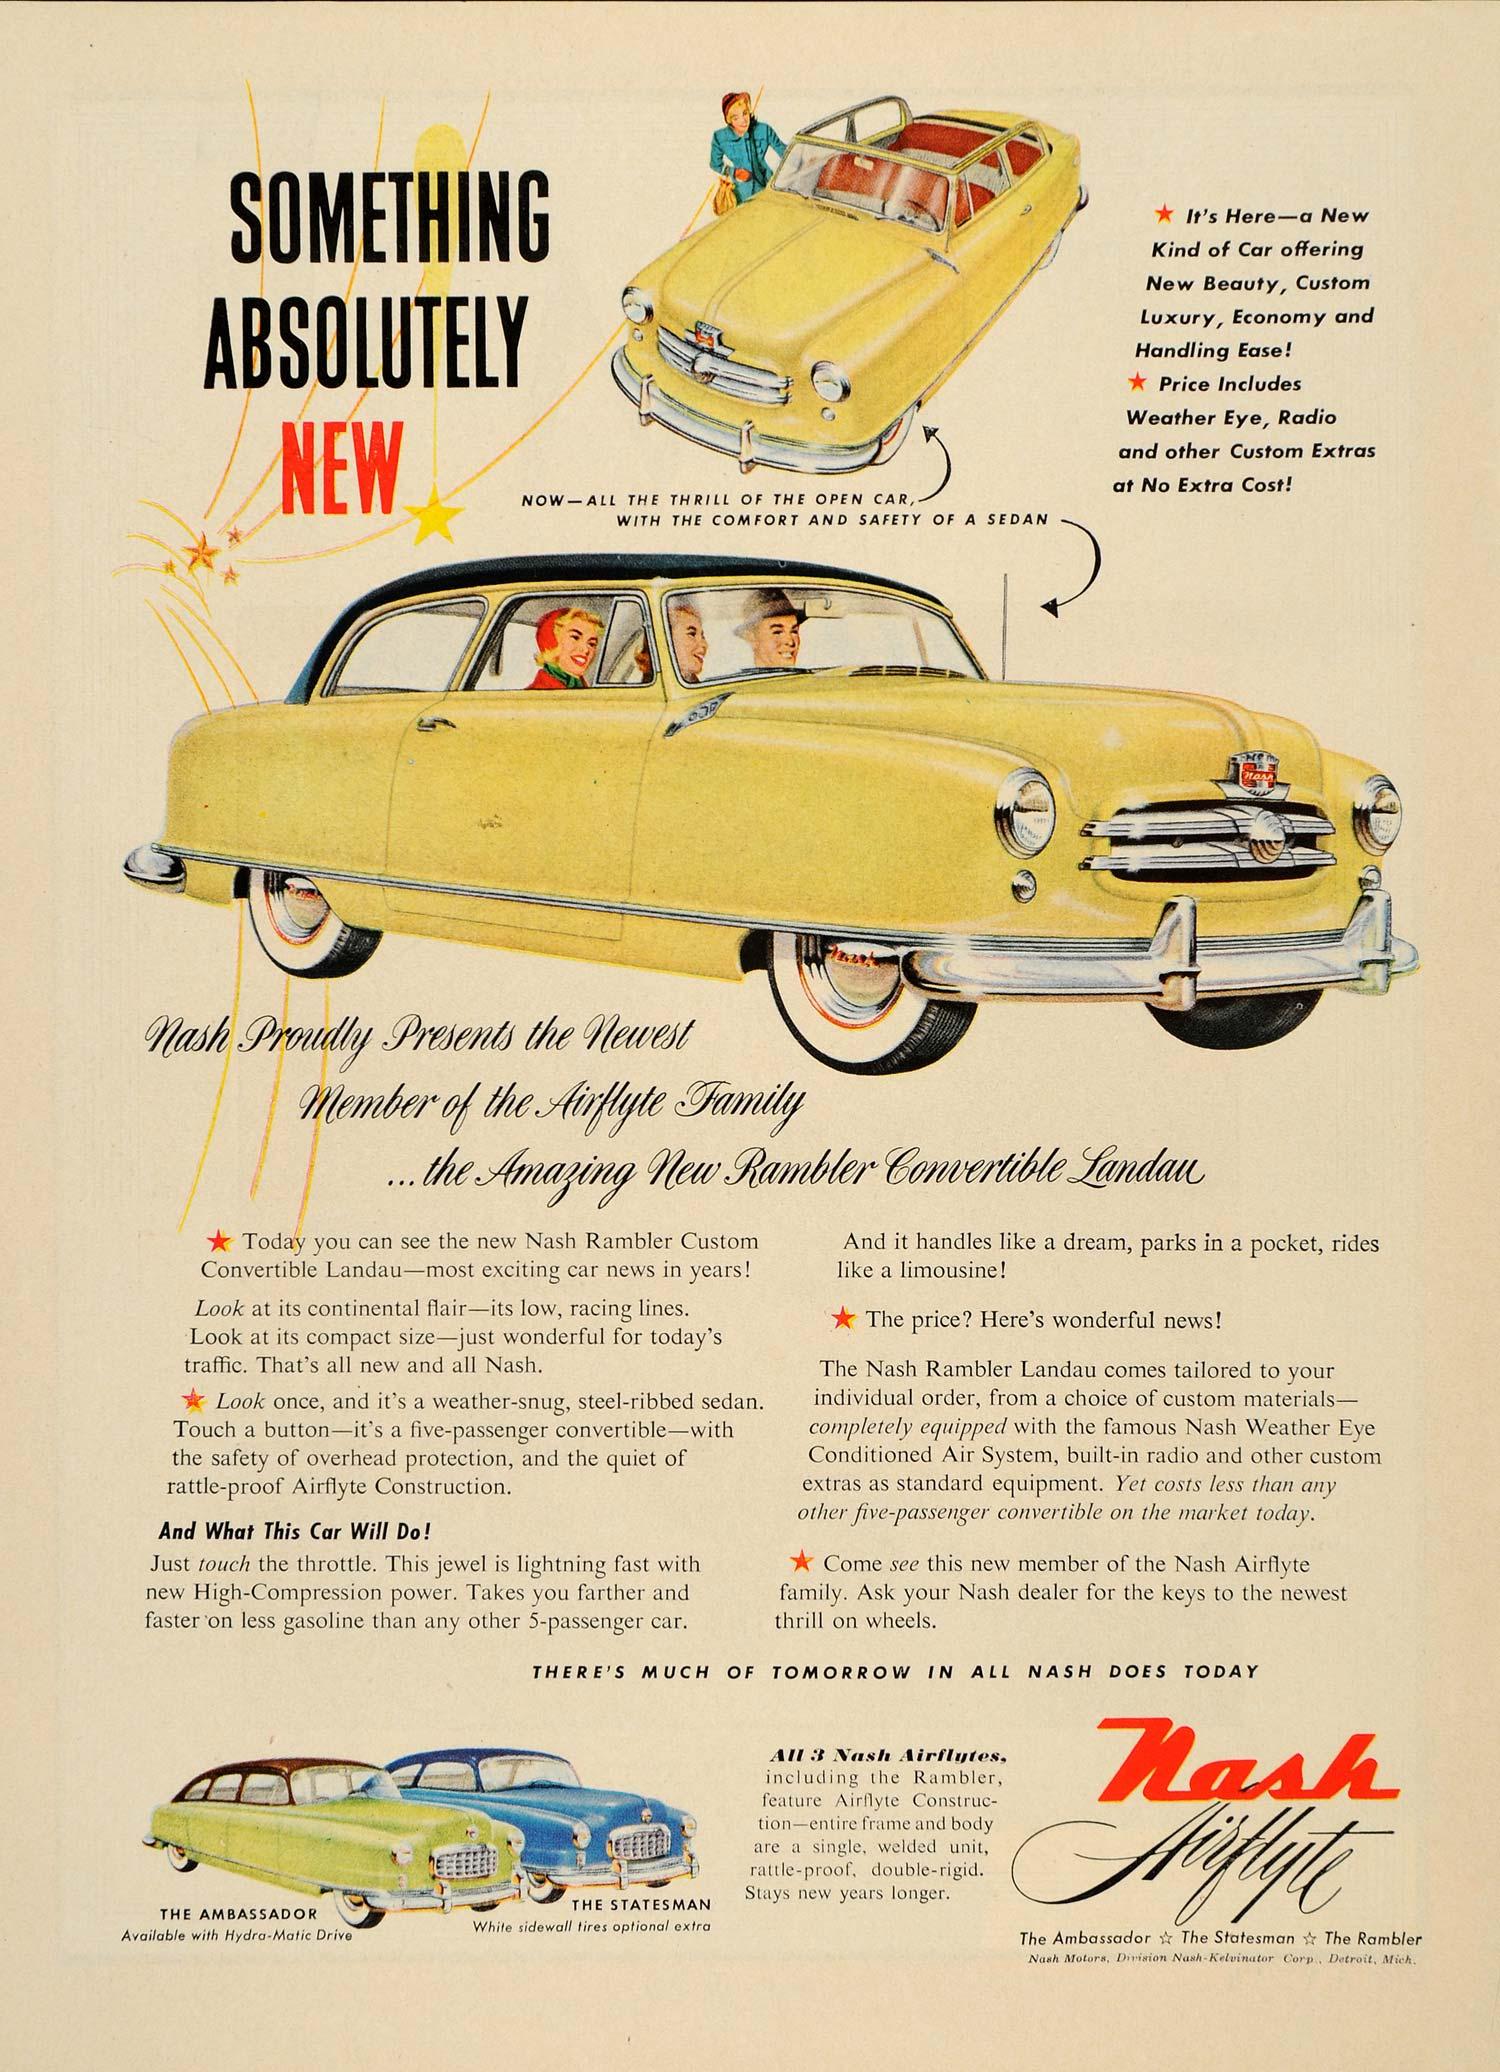 1950 Nash Rambler ad